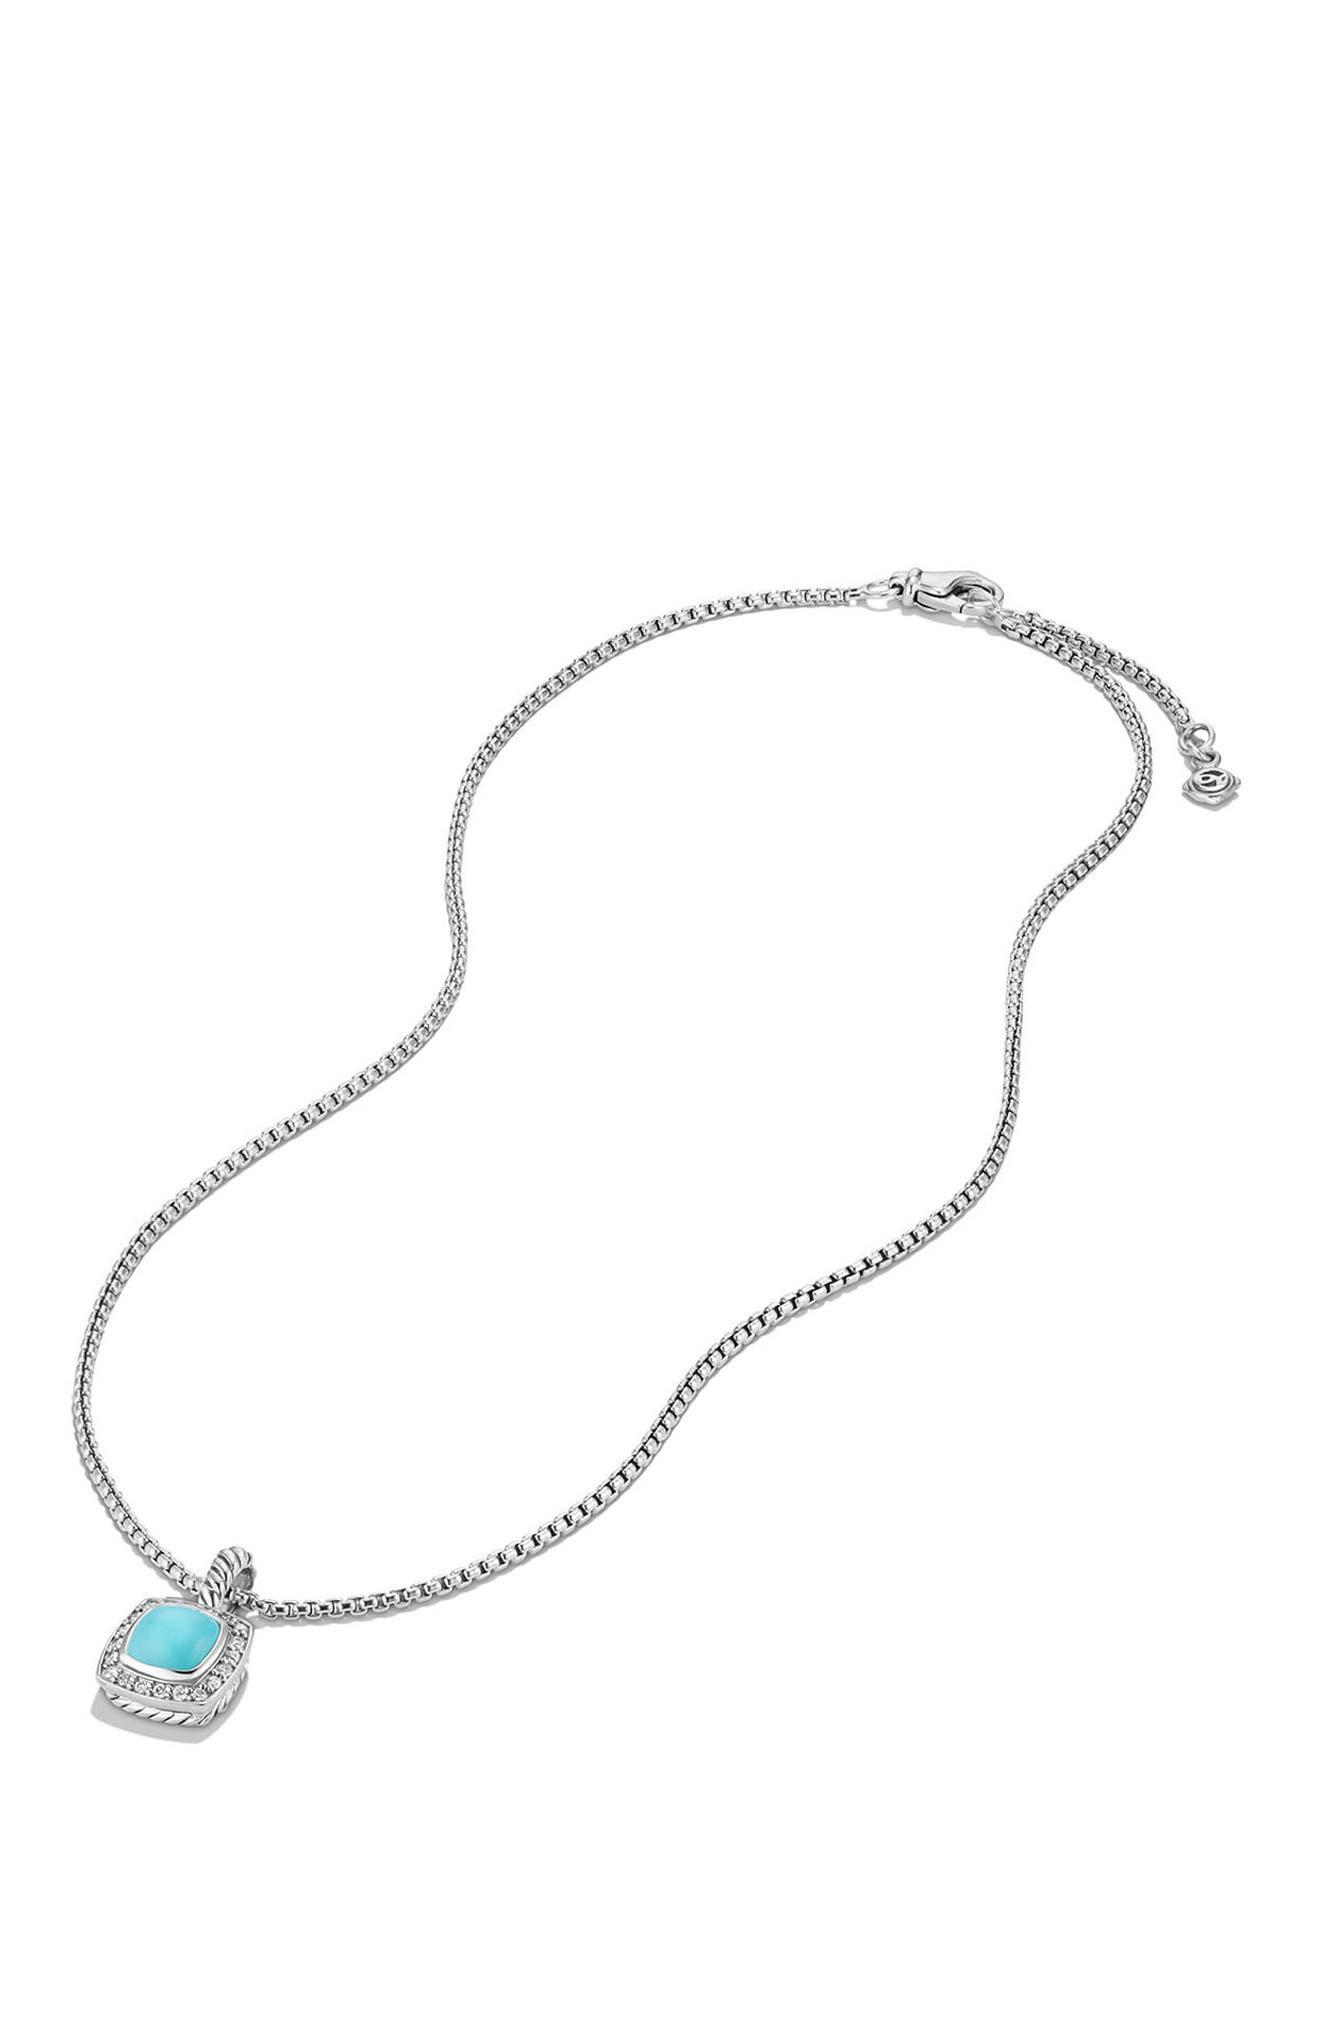 Petite Albion<sup>®</sup> Pendant Necklace with Diamonds,                             Alternate thumbnail 3, color,                             Silver/ Turquoise